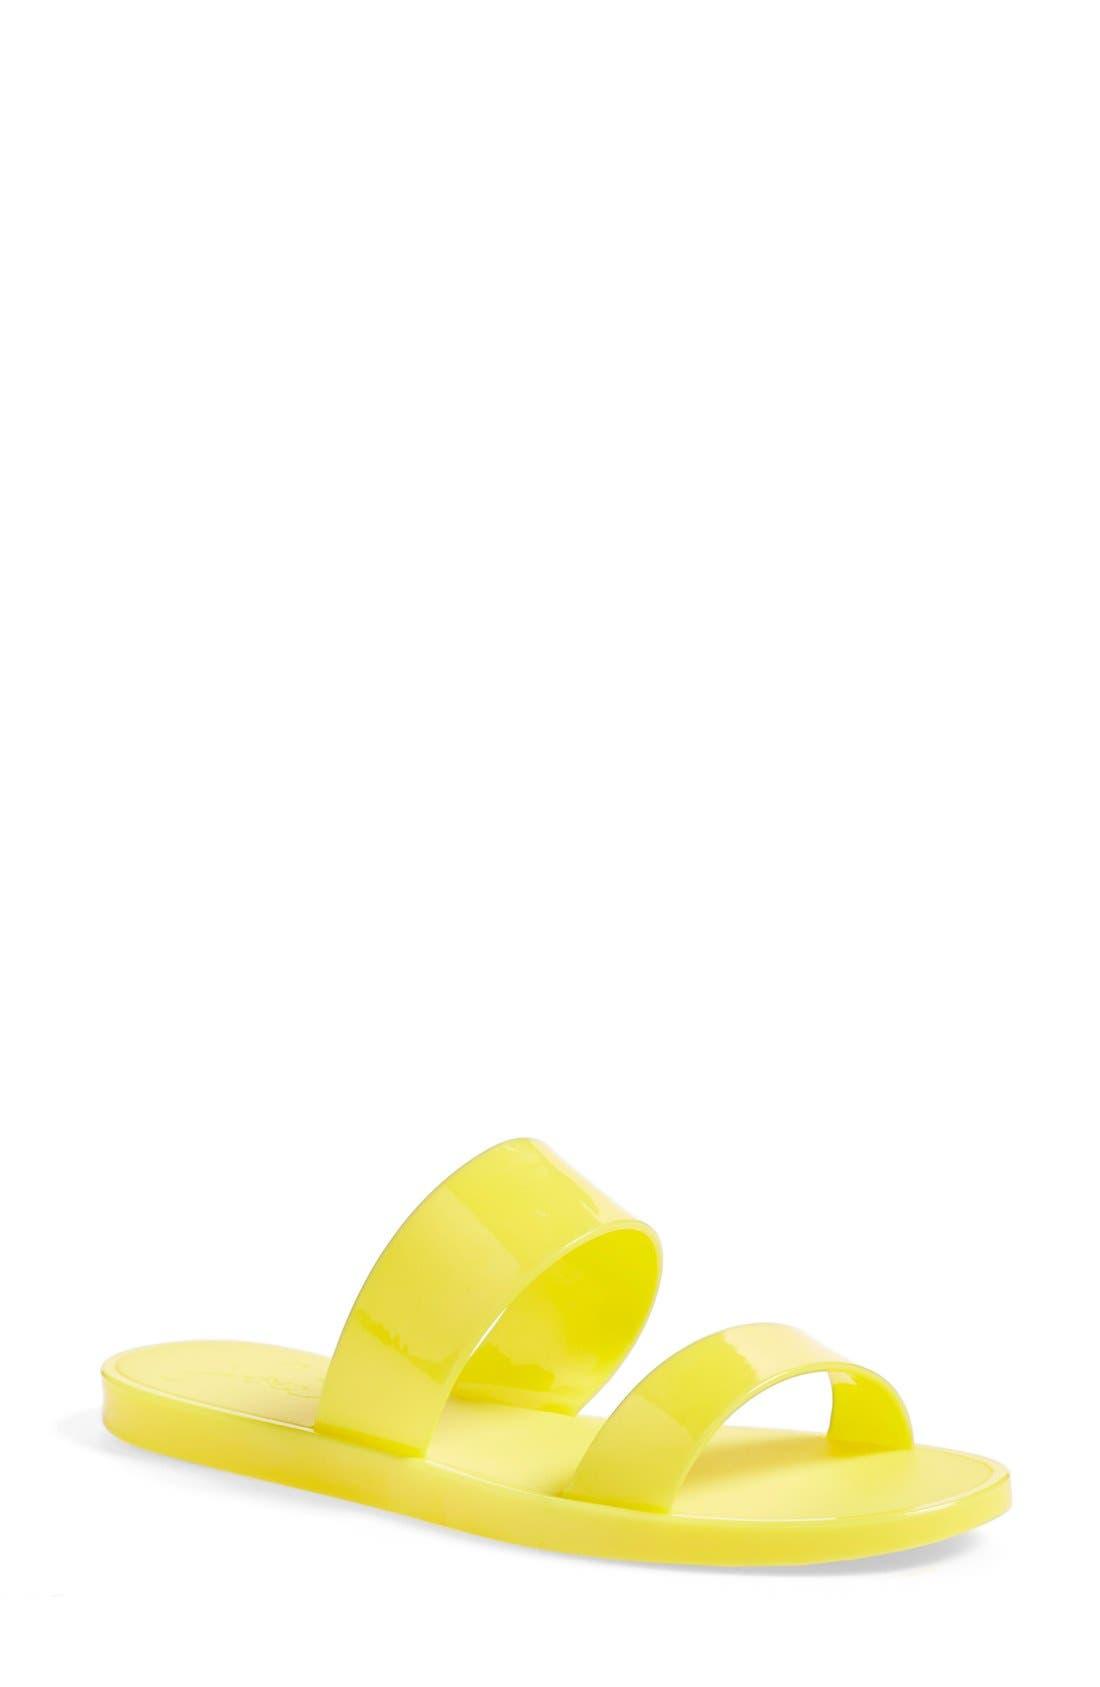 Main Image - Joie 'Laila' Two-Strap Jelly Slide Sandal (Women)